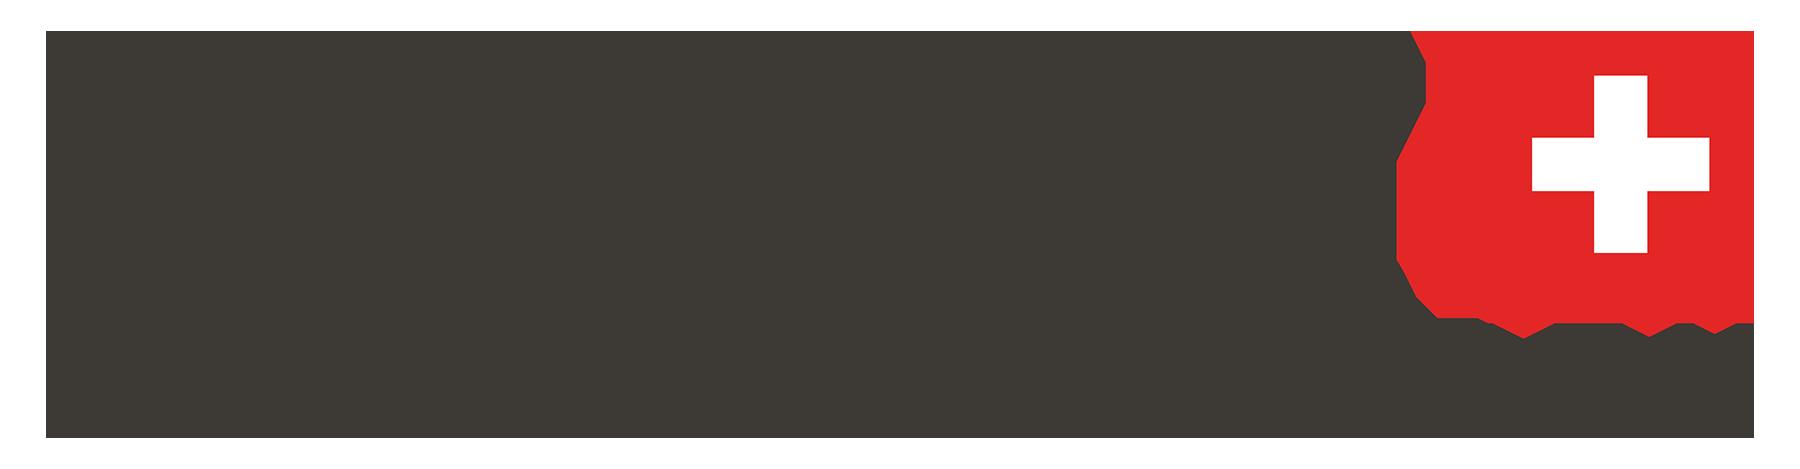 BitBox02 logo